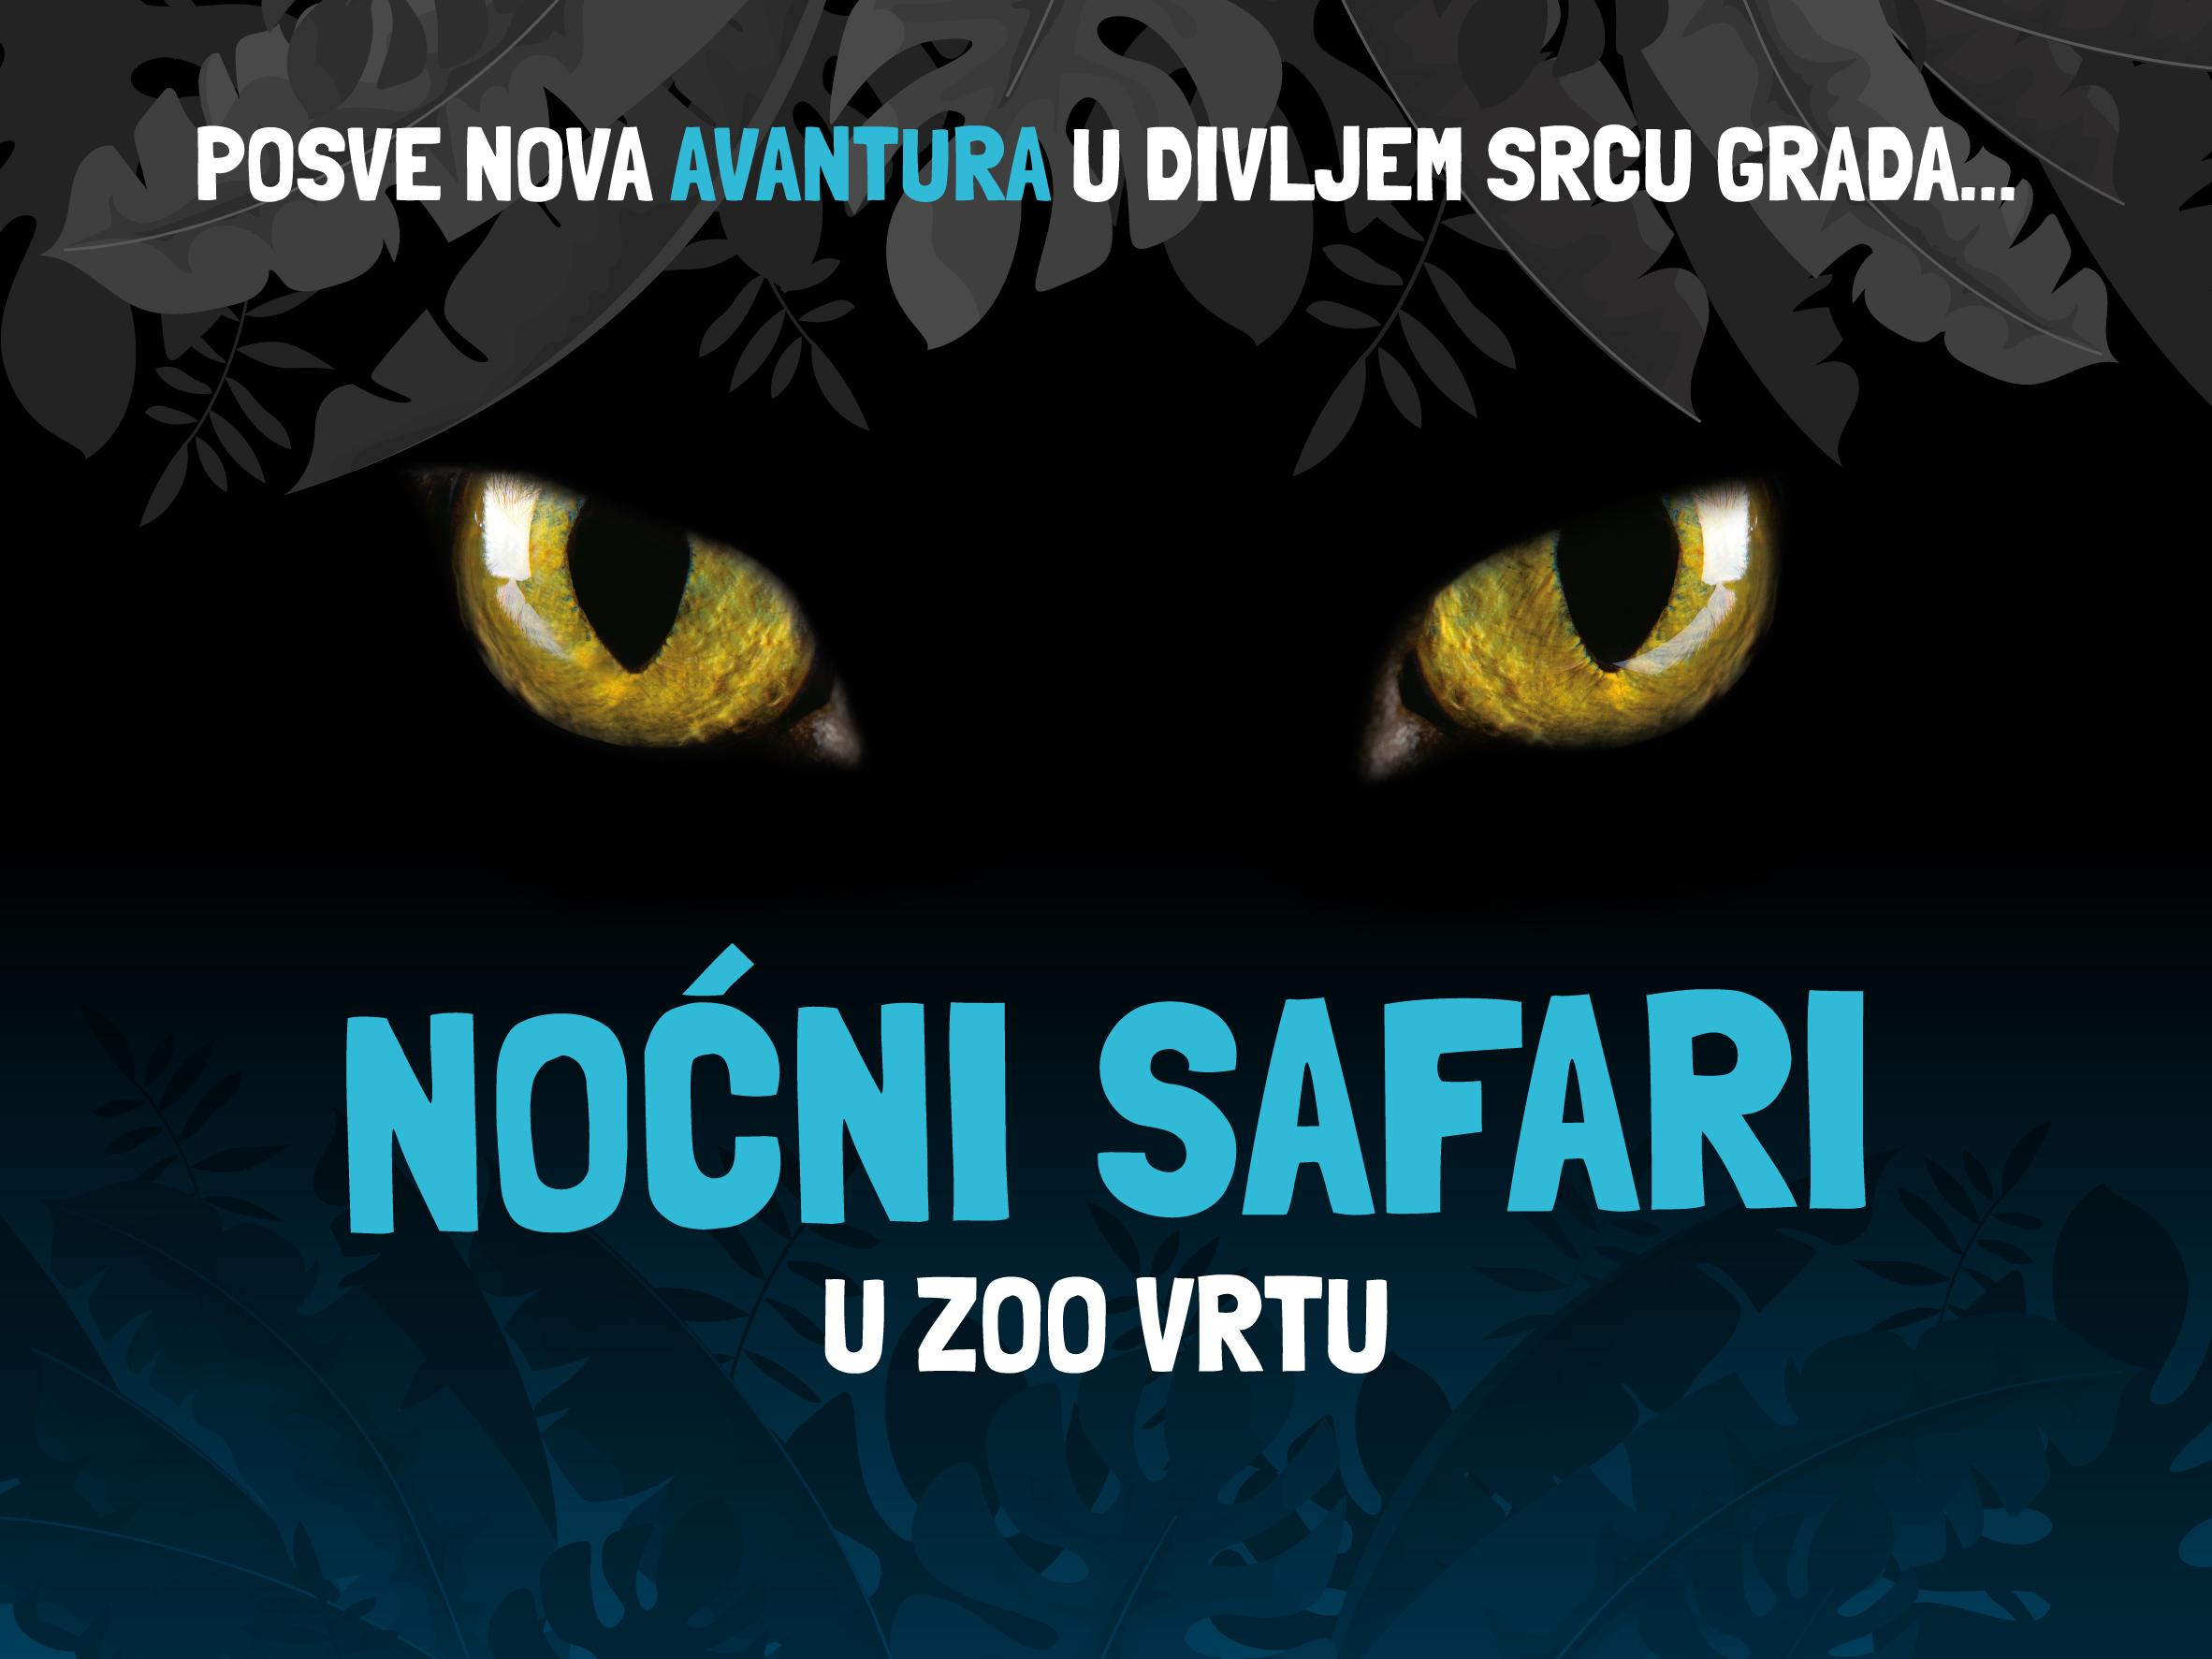 Noćni safari u Zoo vrtu